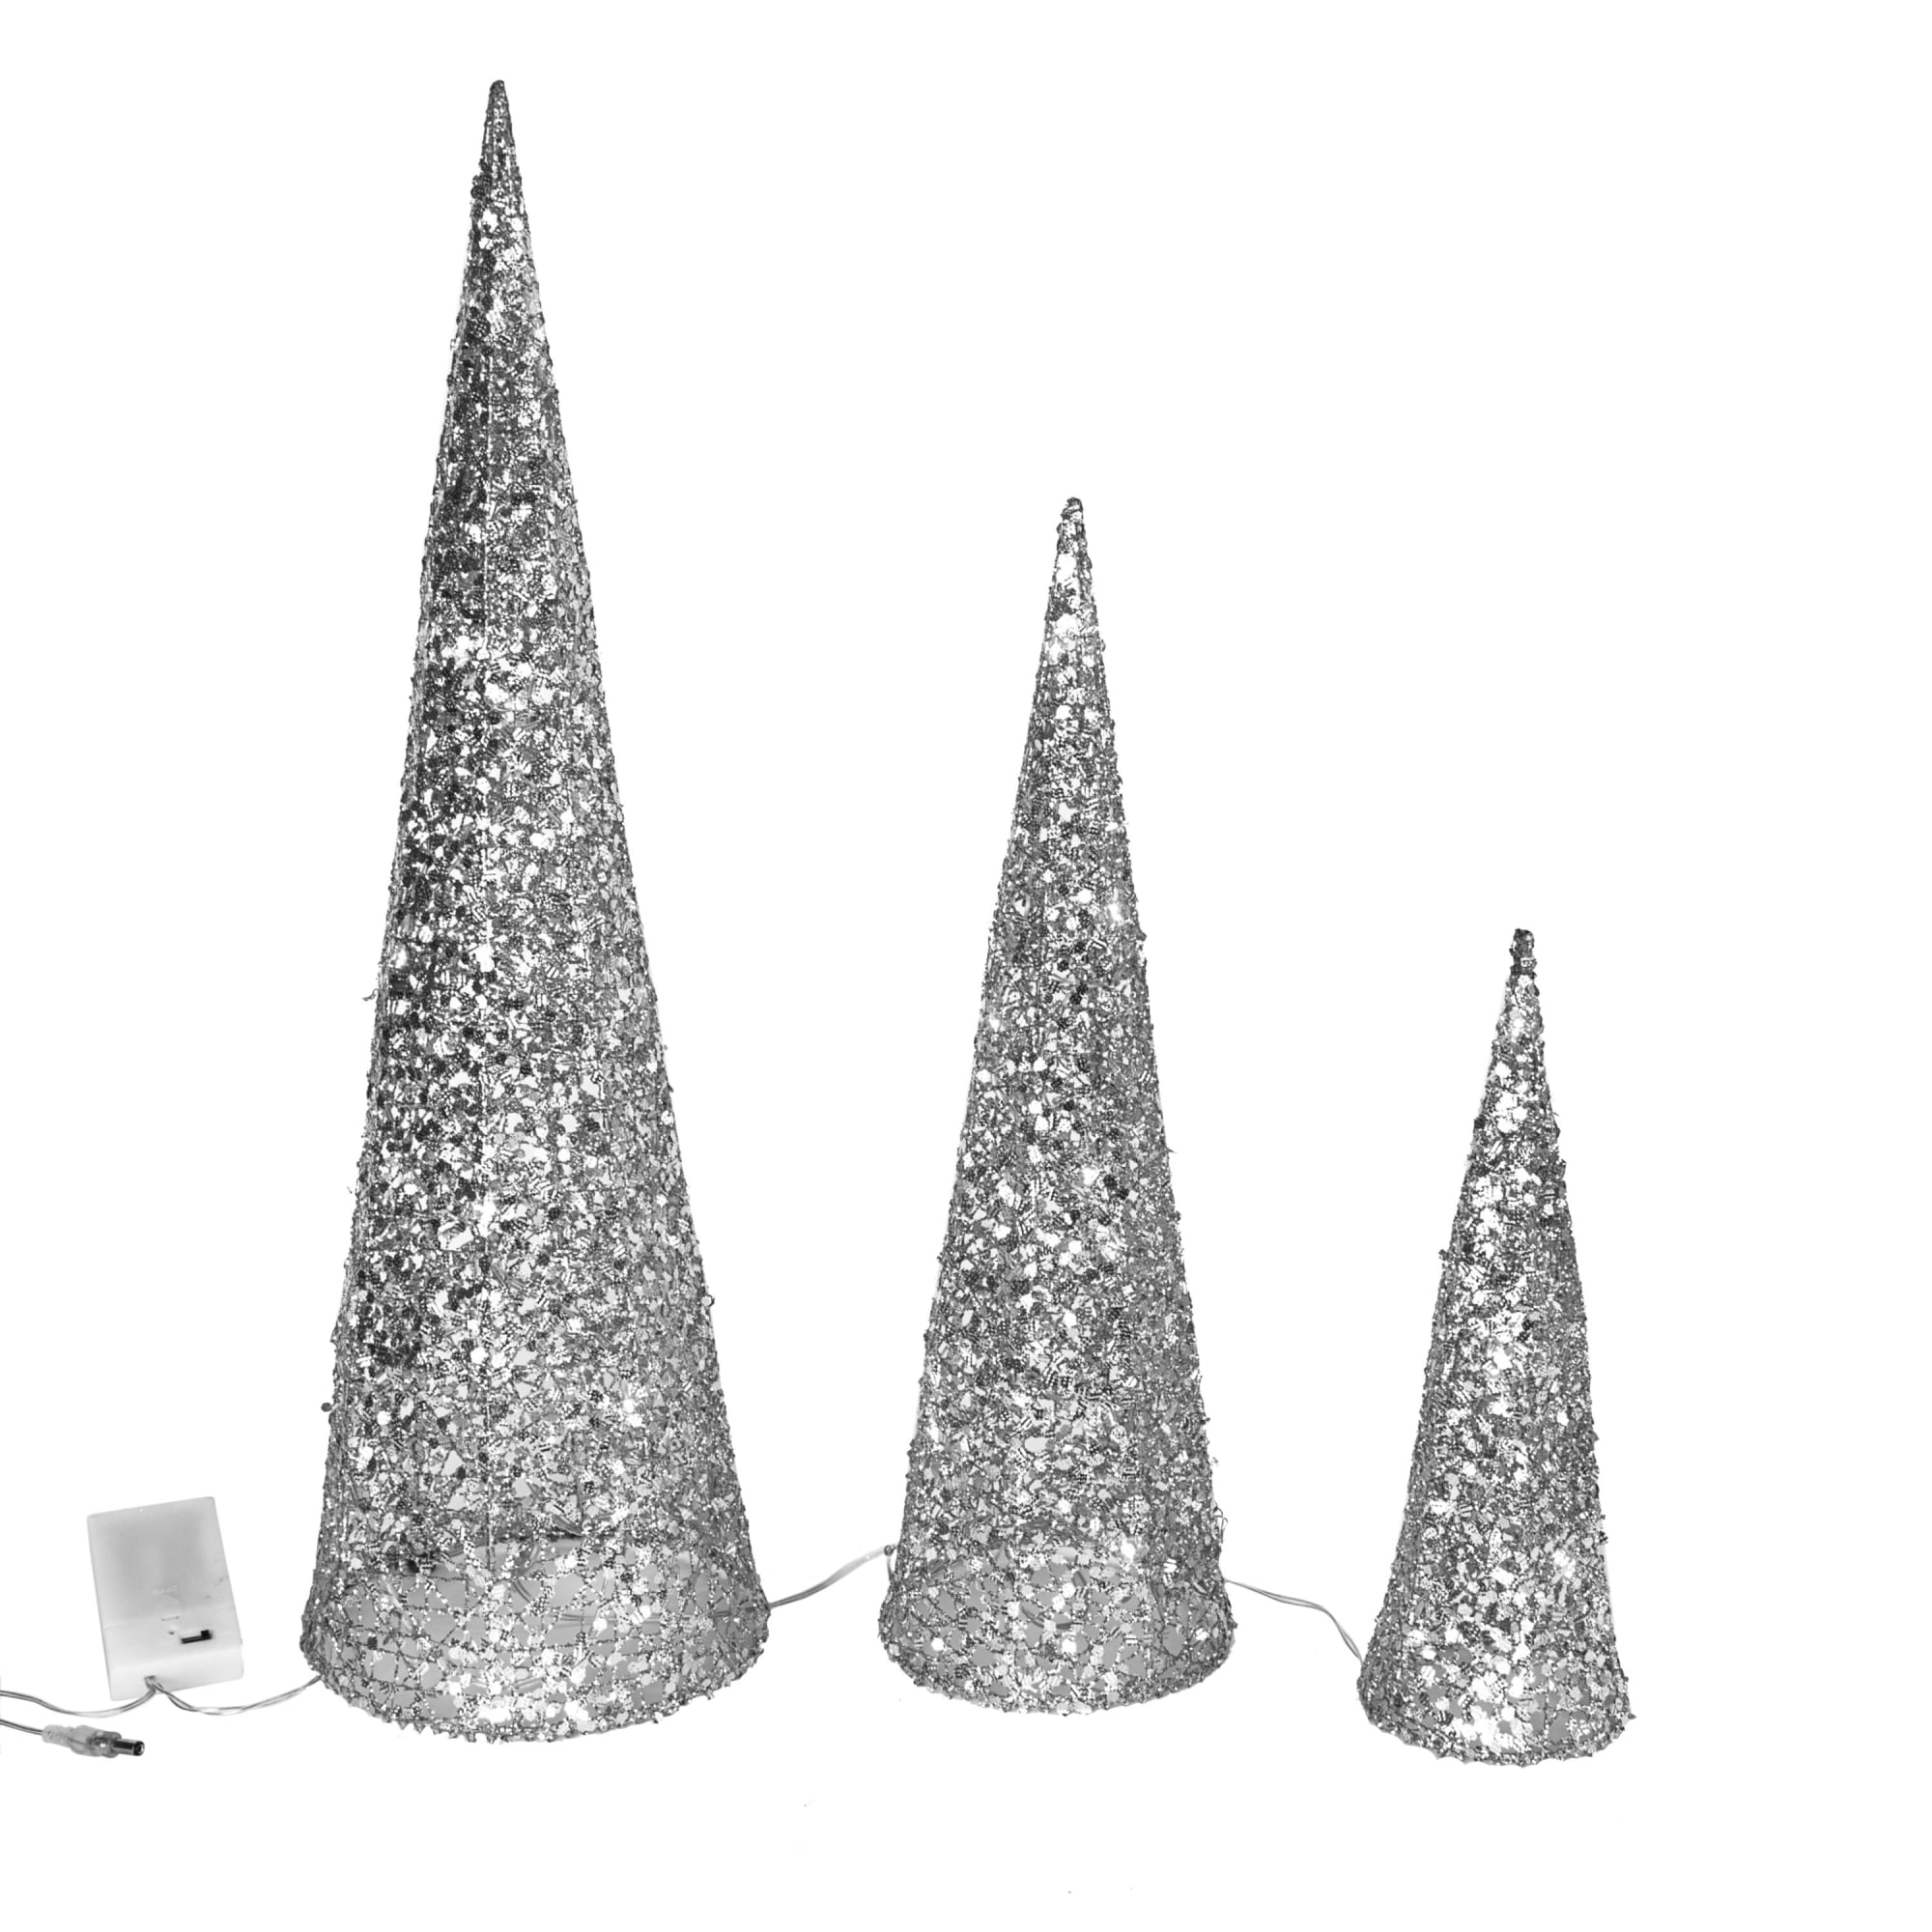 Weihnachtsbeleuchtung Kegel.Led Deko Objekt 3 Tlg Kegel Silber